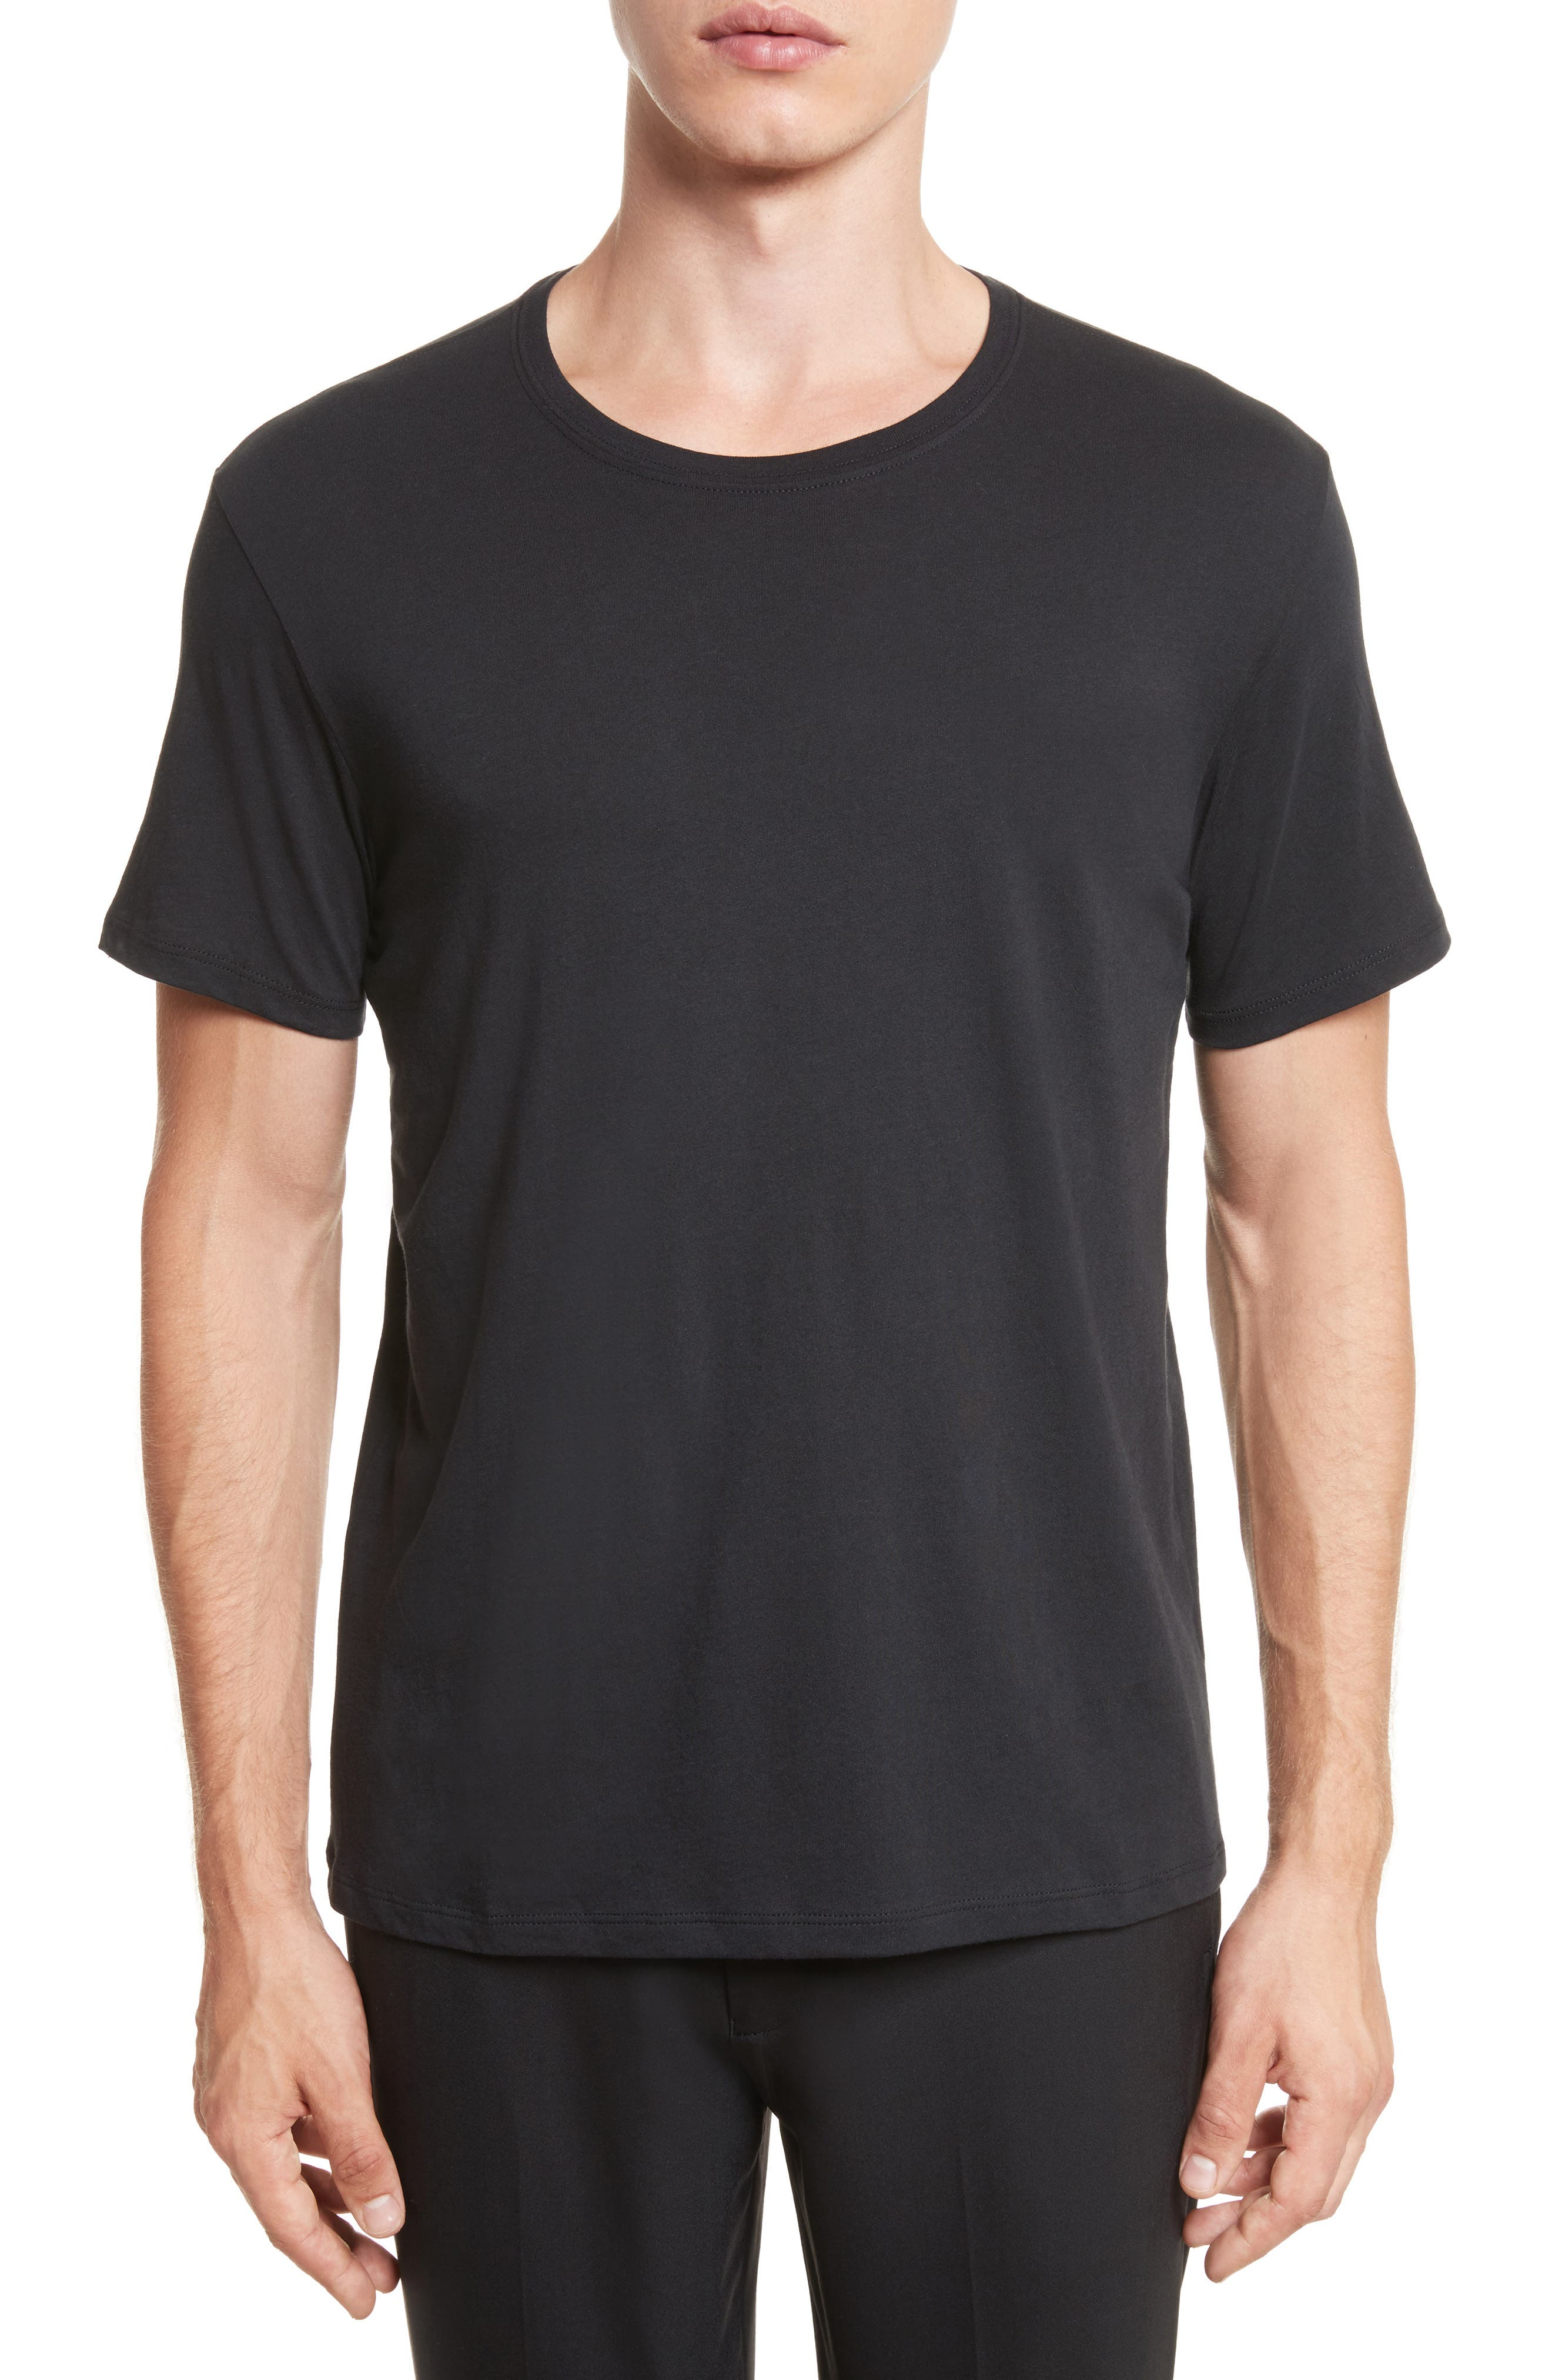 Alternate Image 1 Selected - ATM Anthony Thomas Melillo Cotton Jersey T-Shirt